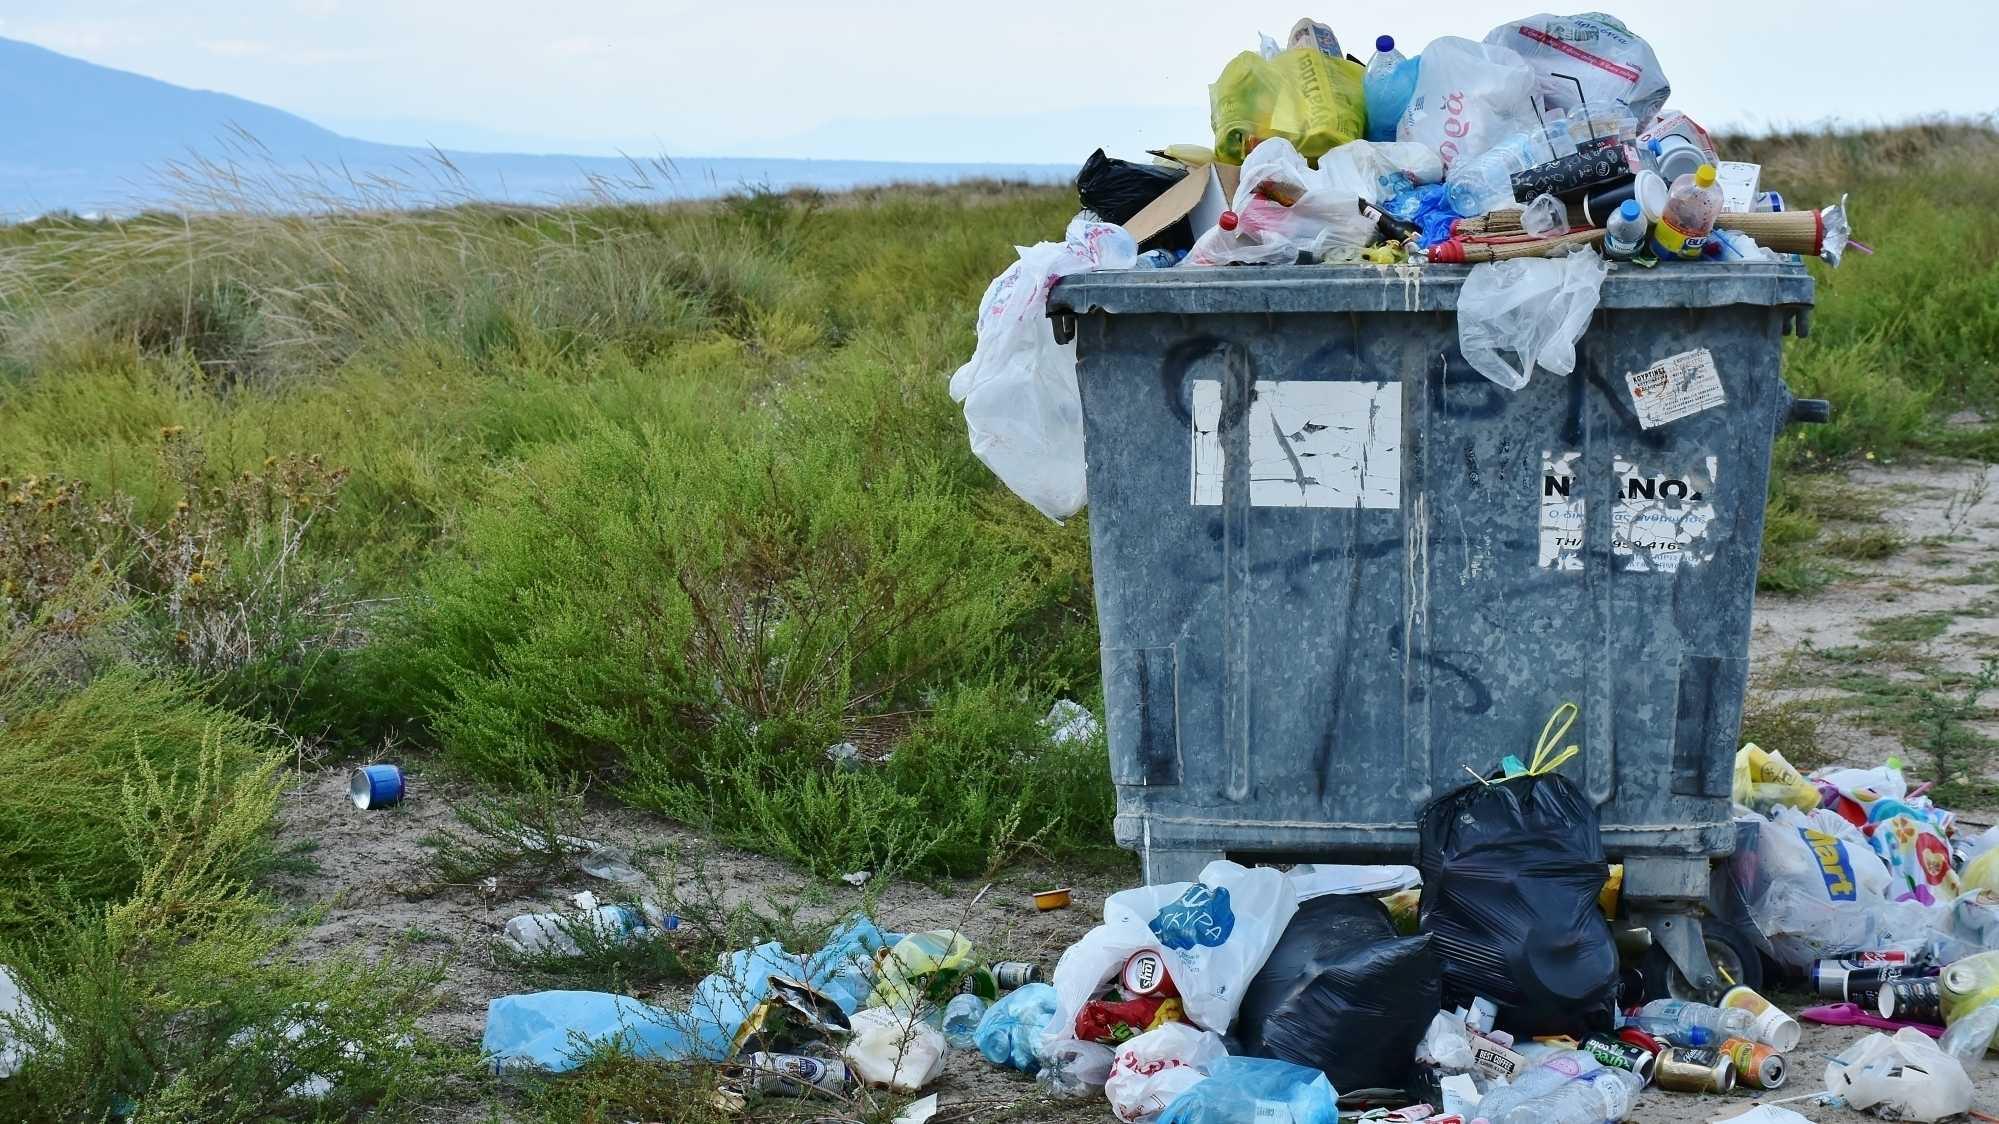 Abfall, Müll, Verpackungen, Plastikmüll